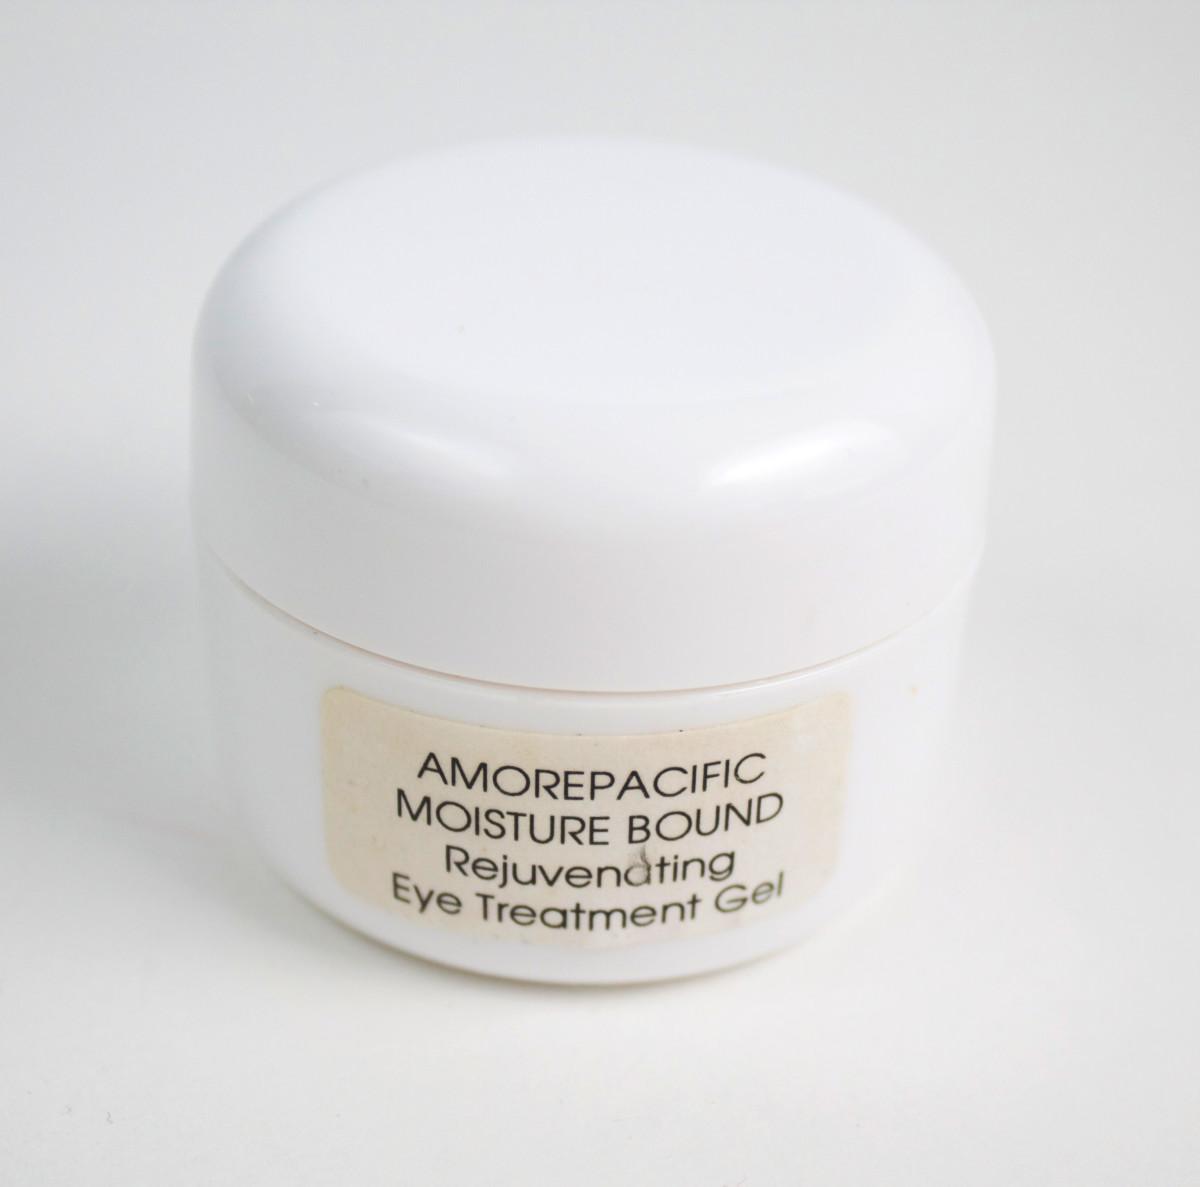 AmorePacific Rejuvenating Eye Treatment Gel lab sample